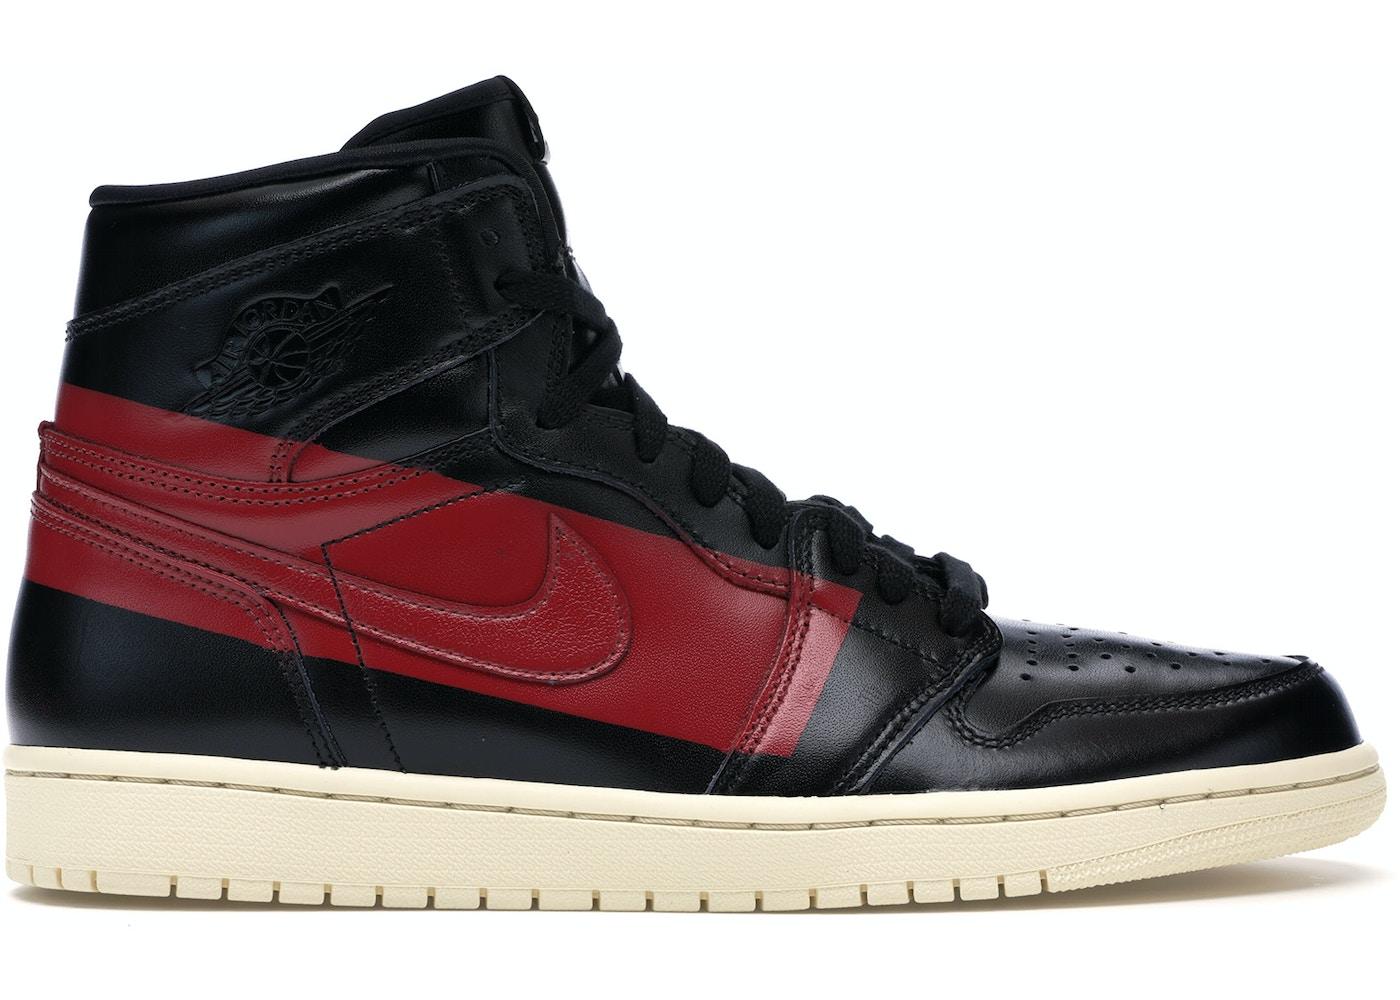 Jordan 1 Retro High Og Defiant Couture Bq6682 006